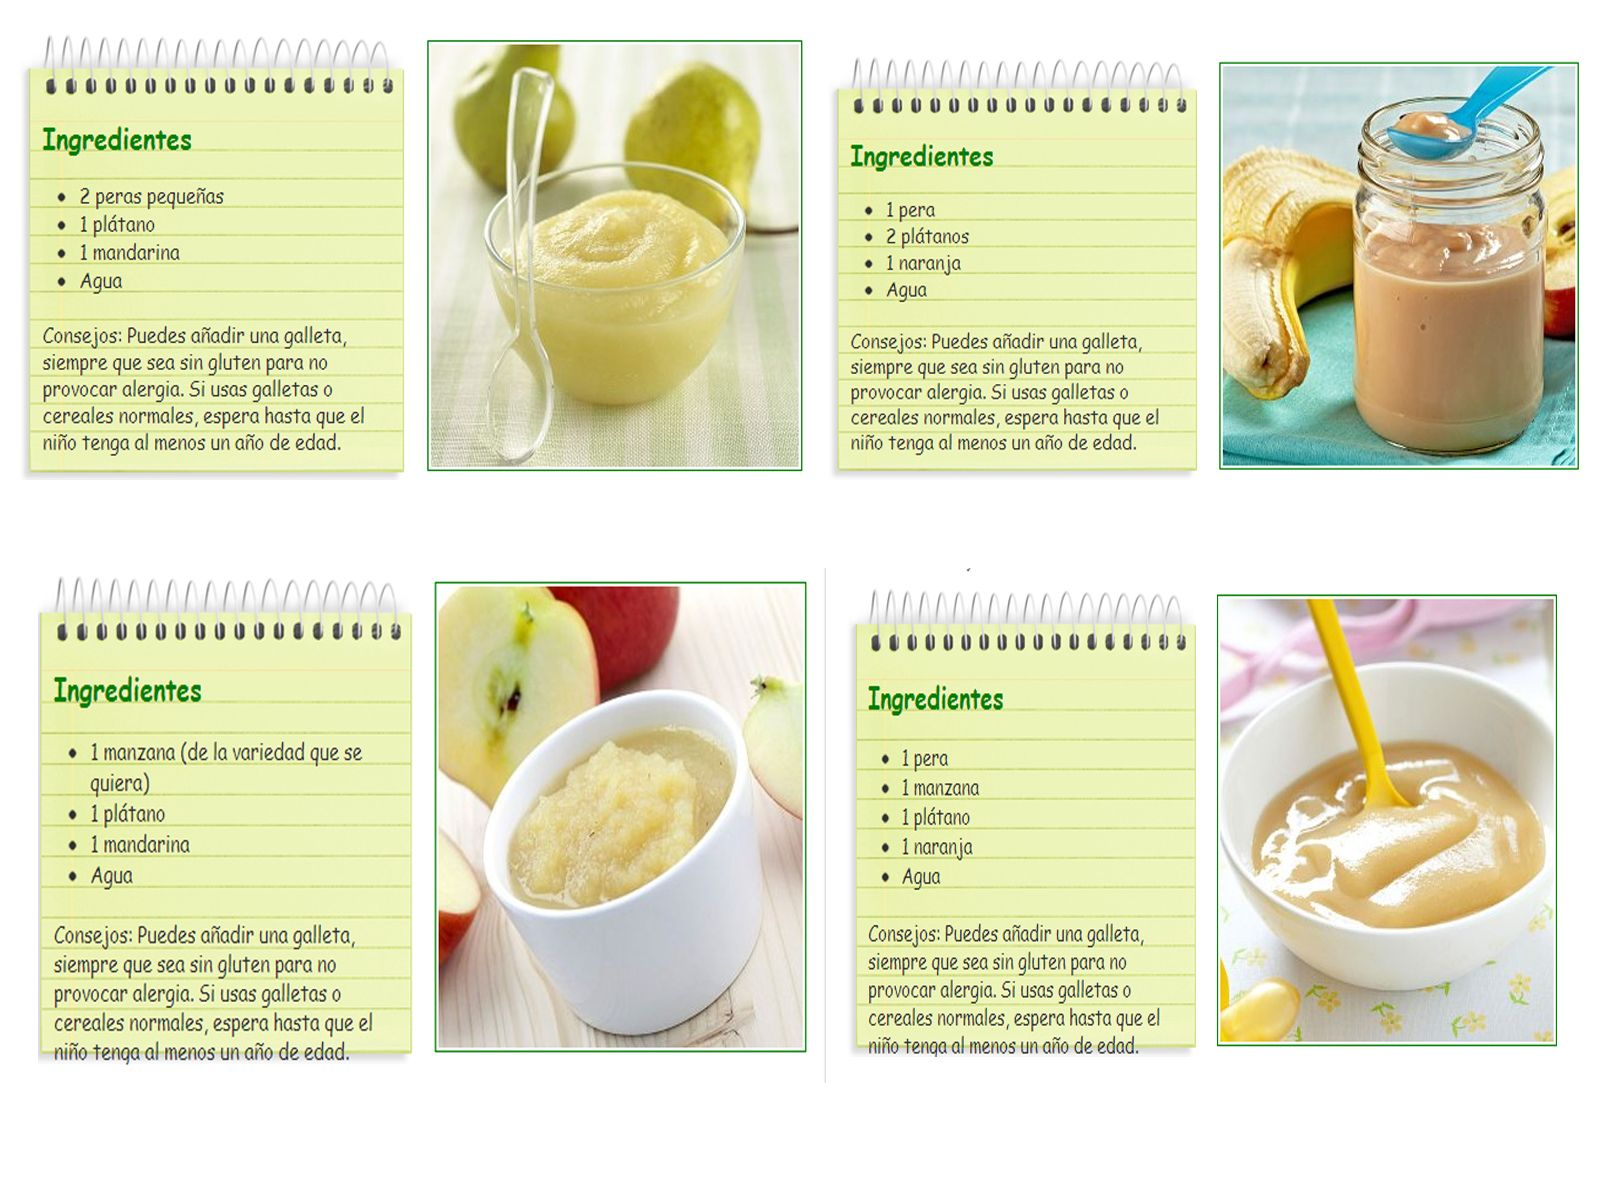 Papillas de fruta bebes pinterest - Pures bebes 6 meses ...